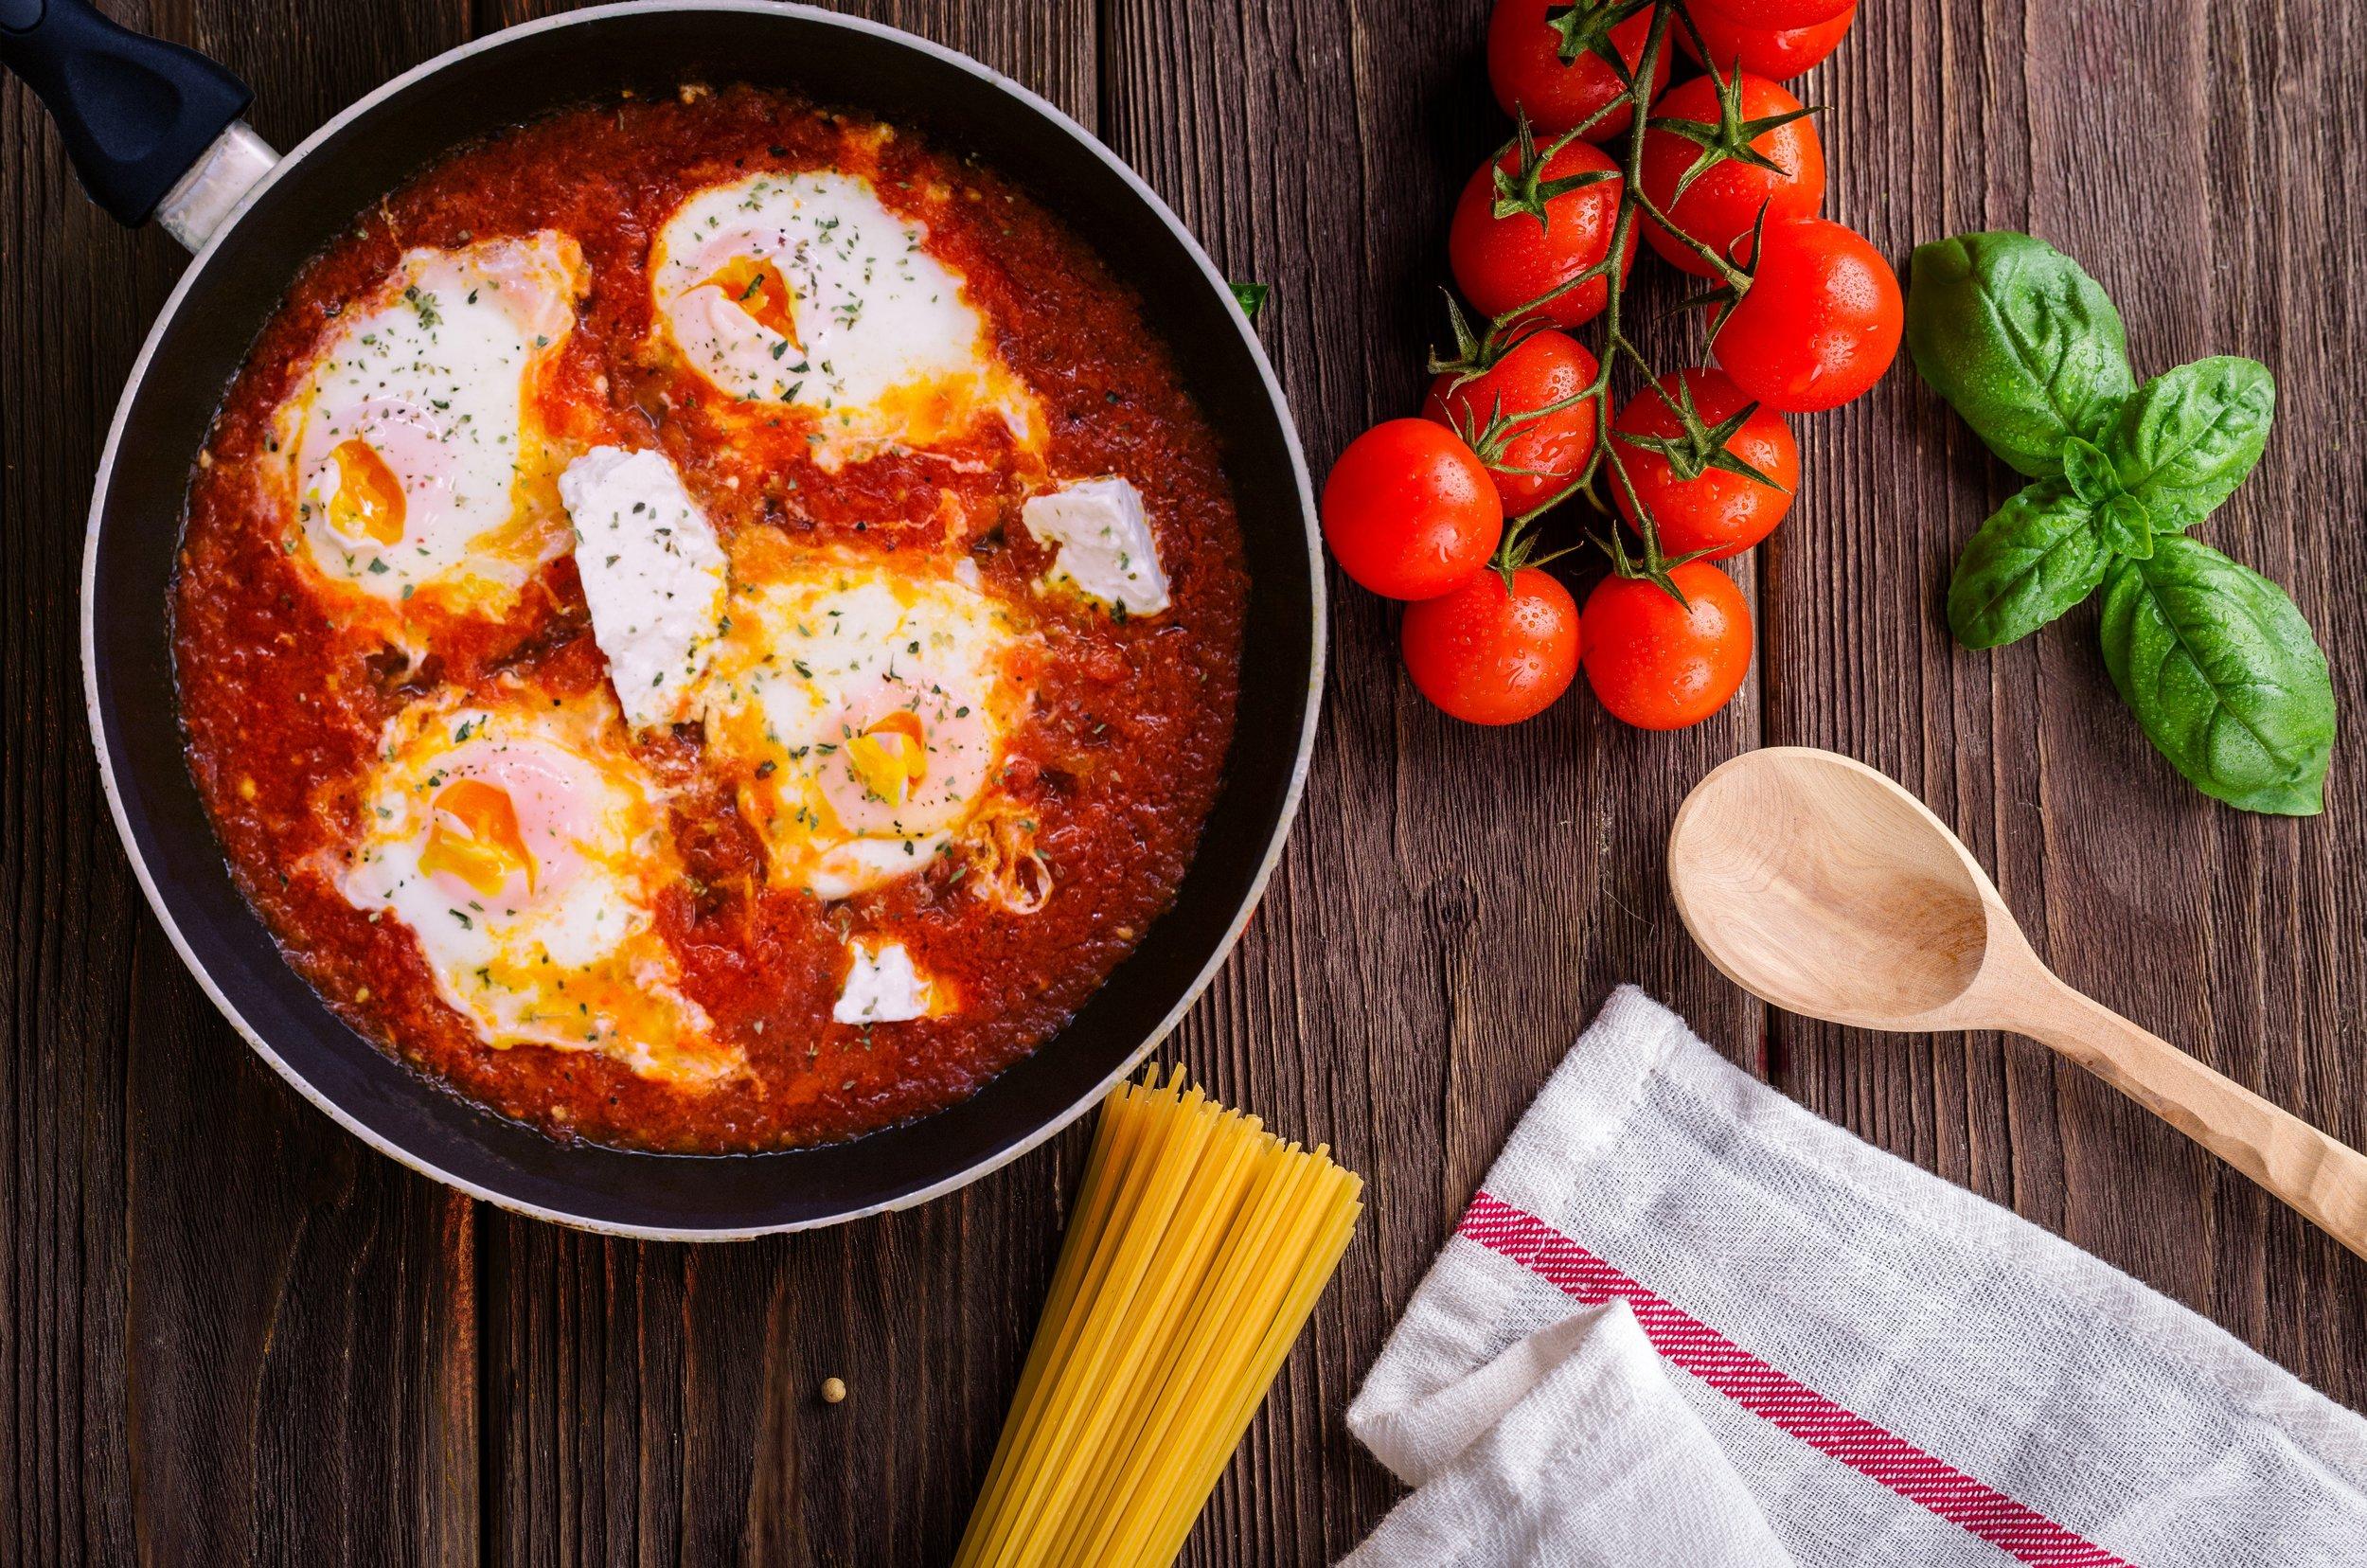 basil-cook-cuisine-691114.jpg